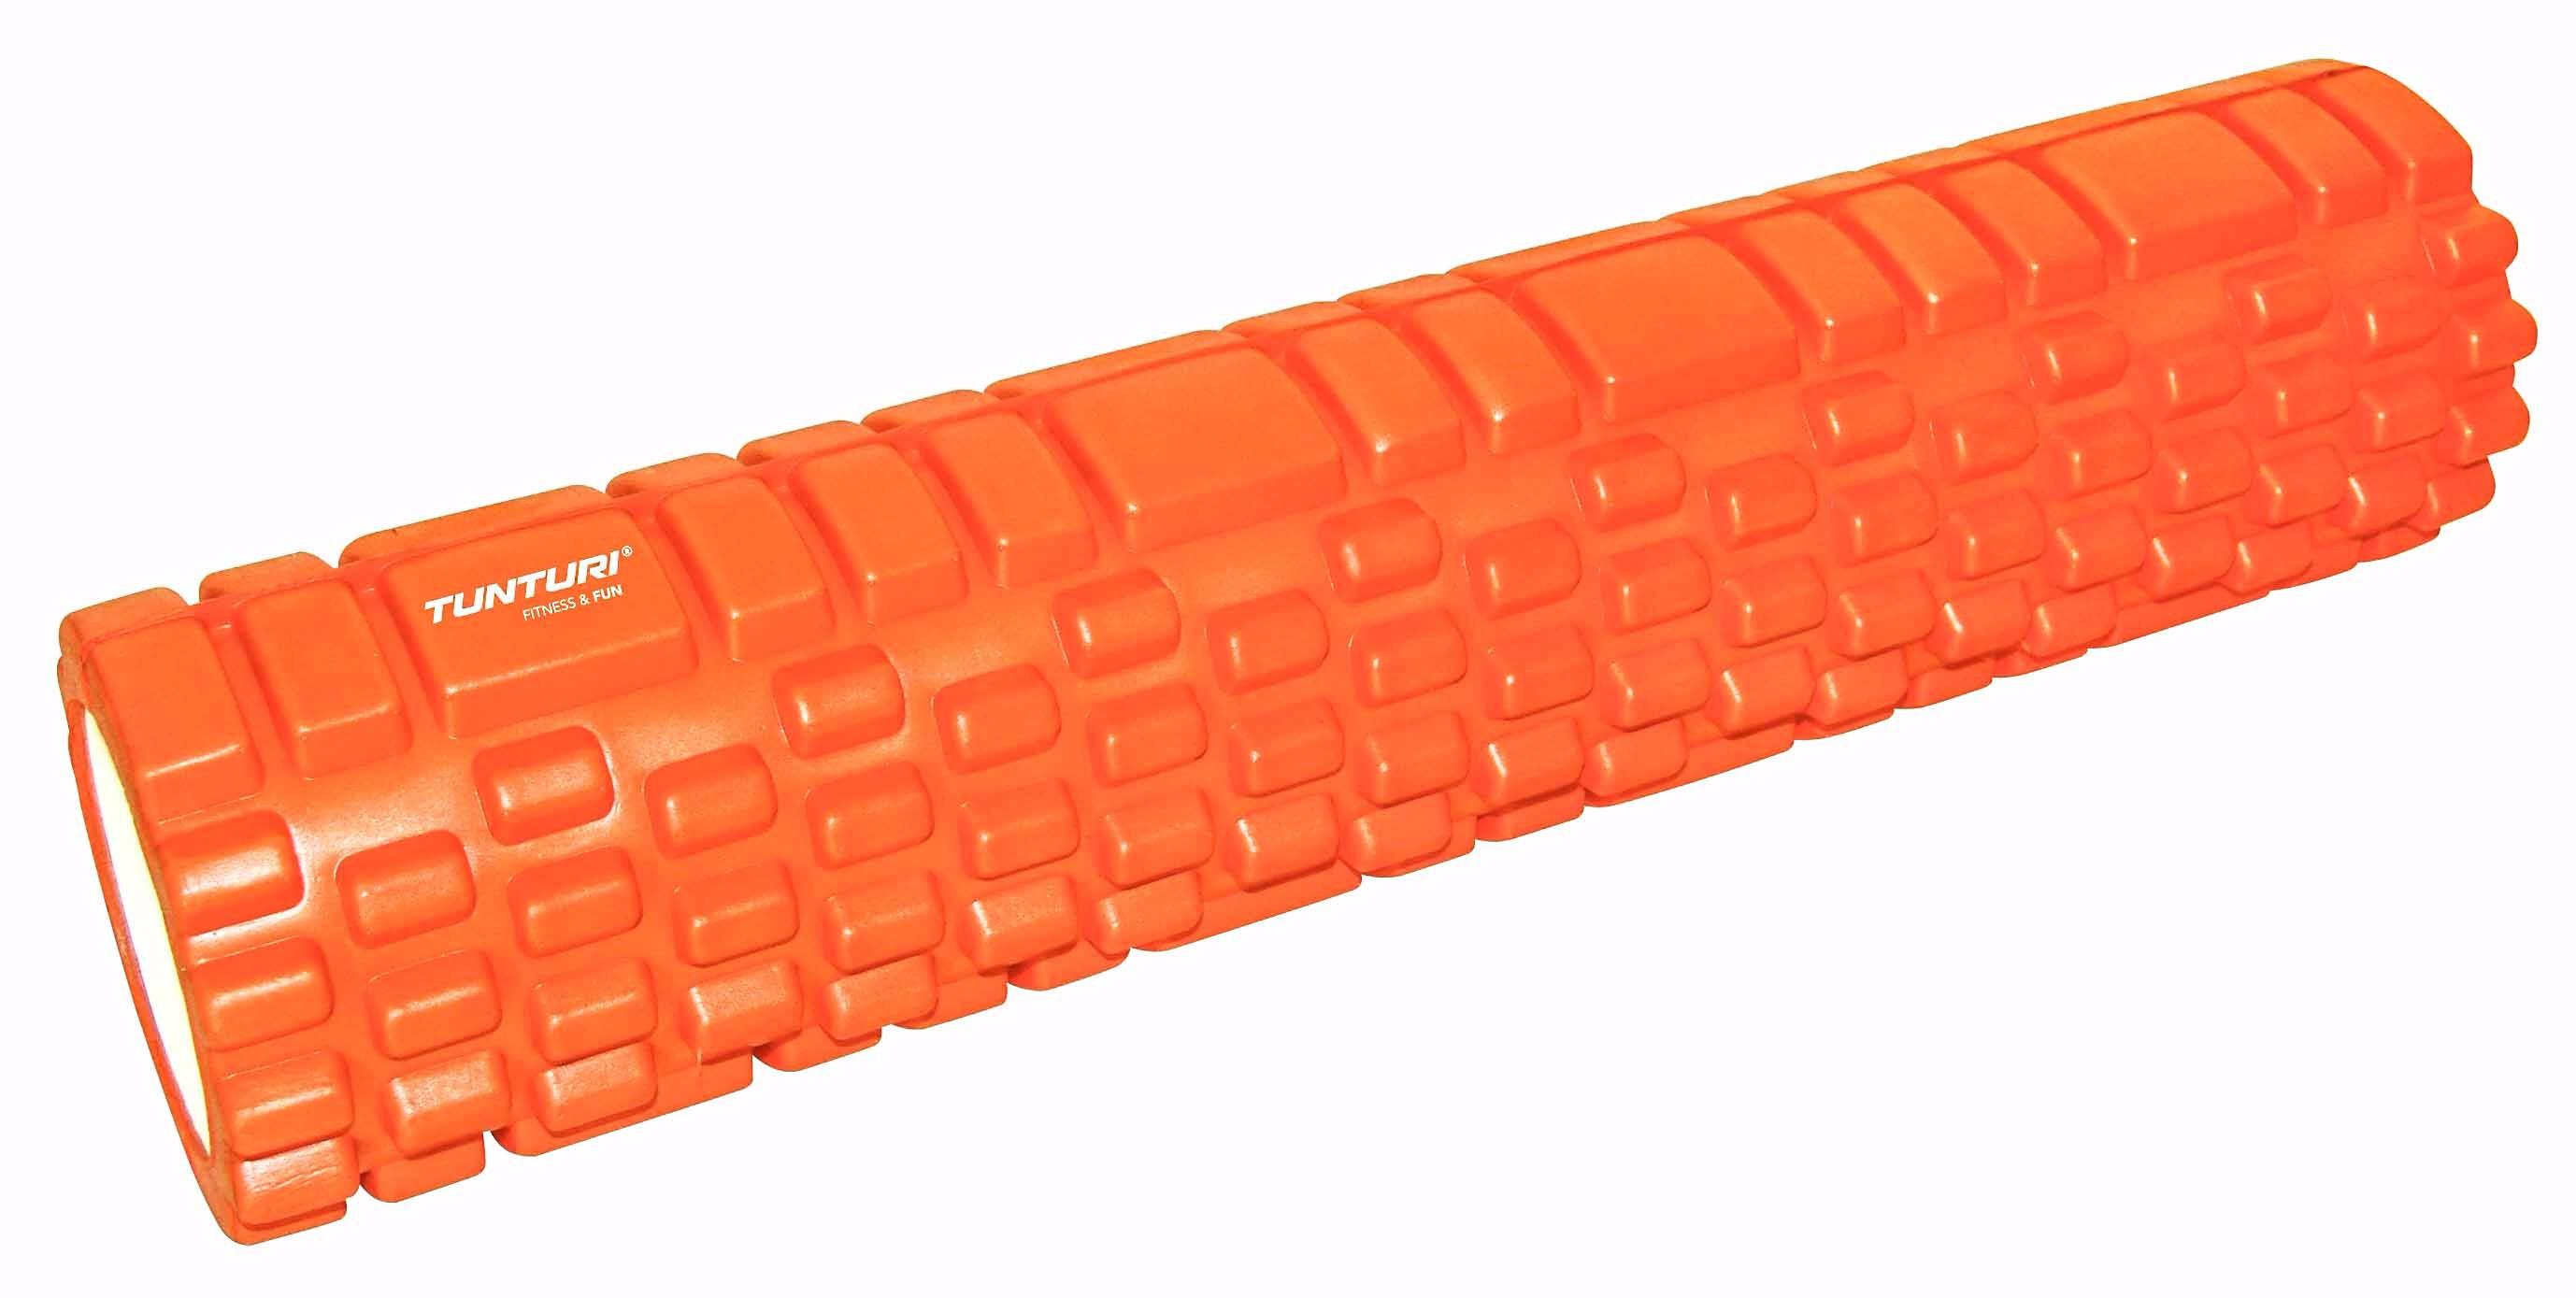 Tunturi-Bremshey Yoga Foam Grid Roller 14 X 61cm. Stuk